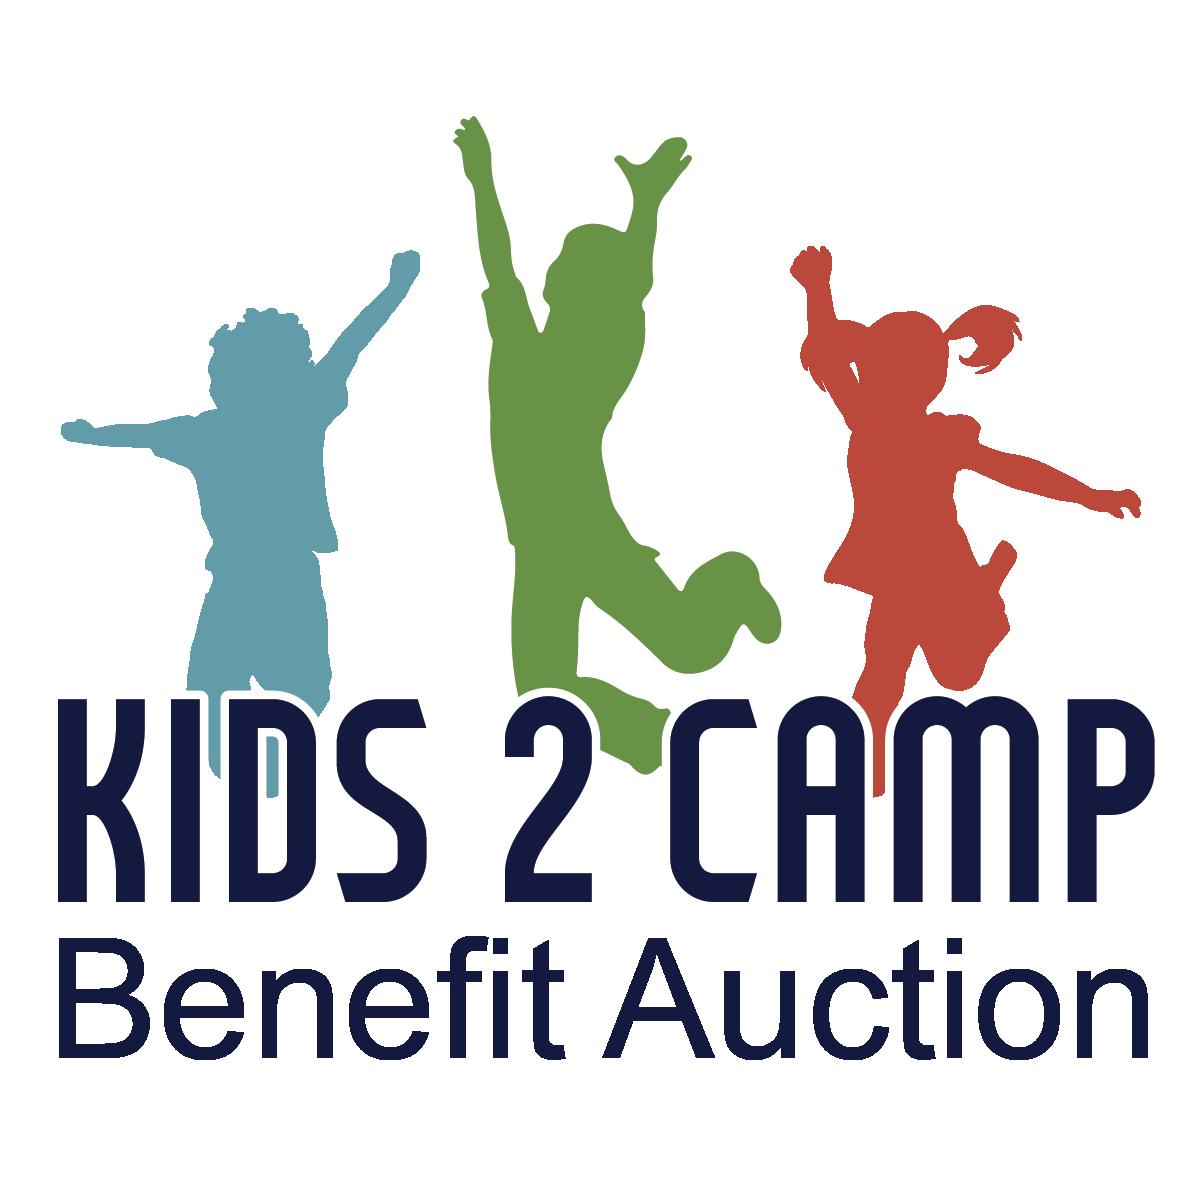 Kids-2-Camp-logo-benefit-auction_Kids-2-Camp-logo